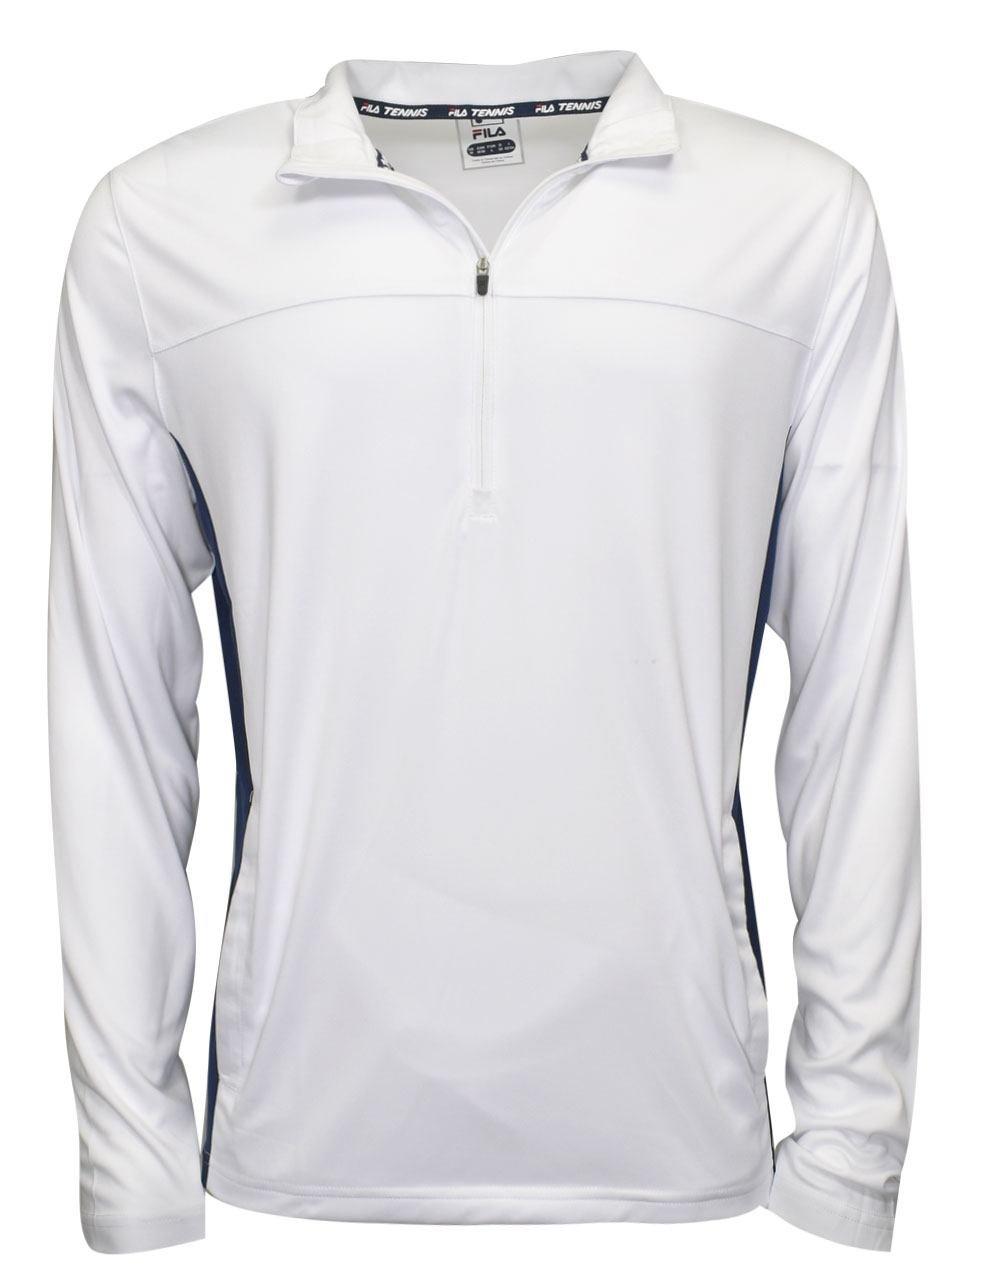 Fila Core Half Zip Jacket White/Navy Size Large